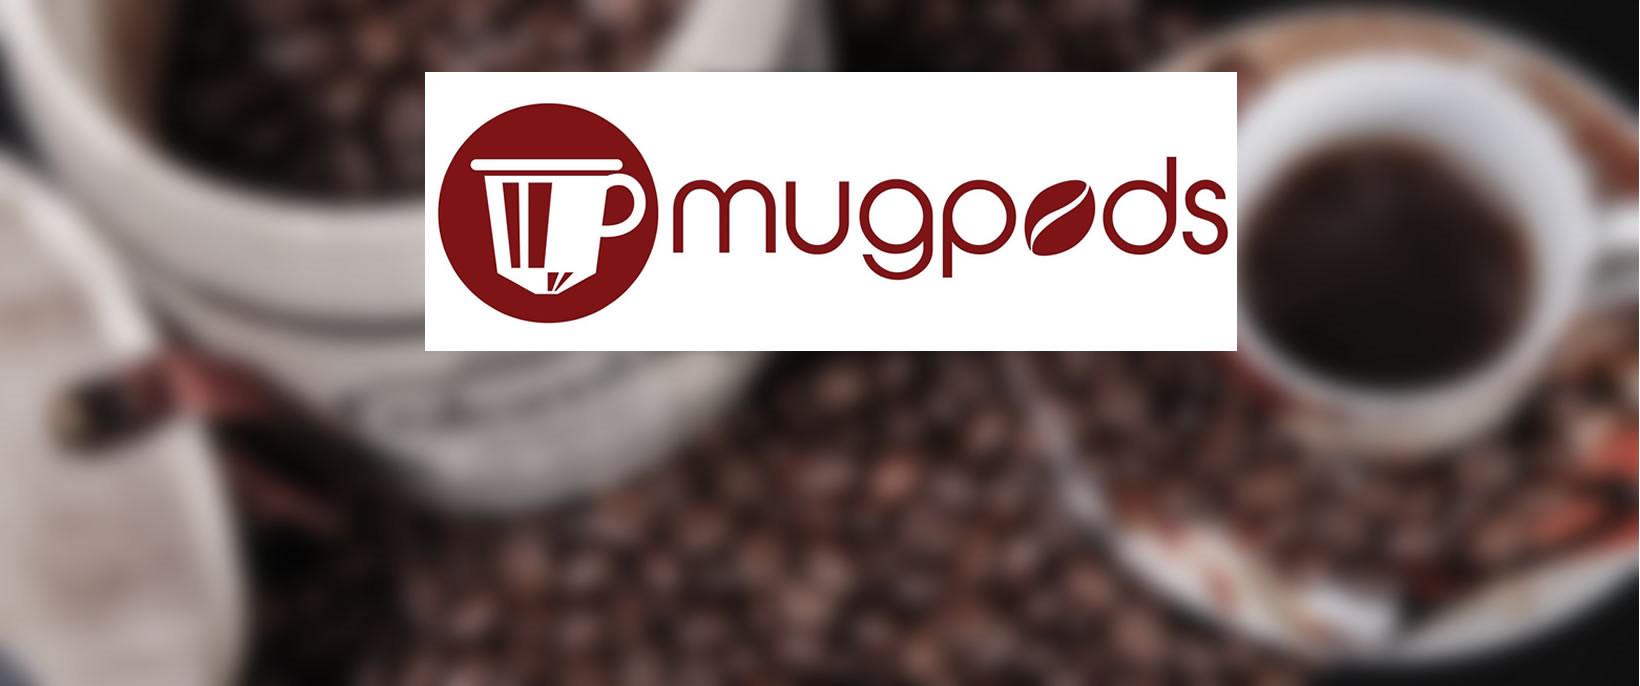 Mugpods Blog